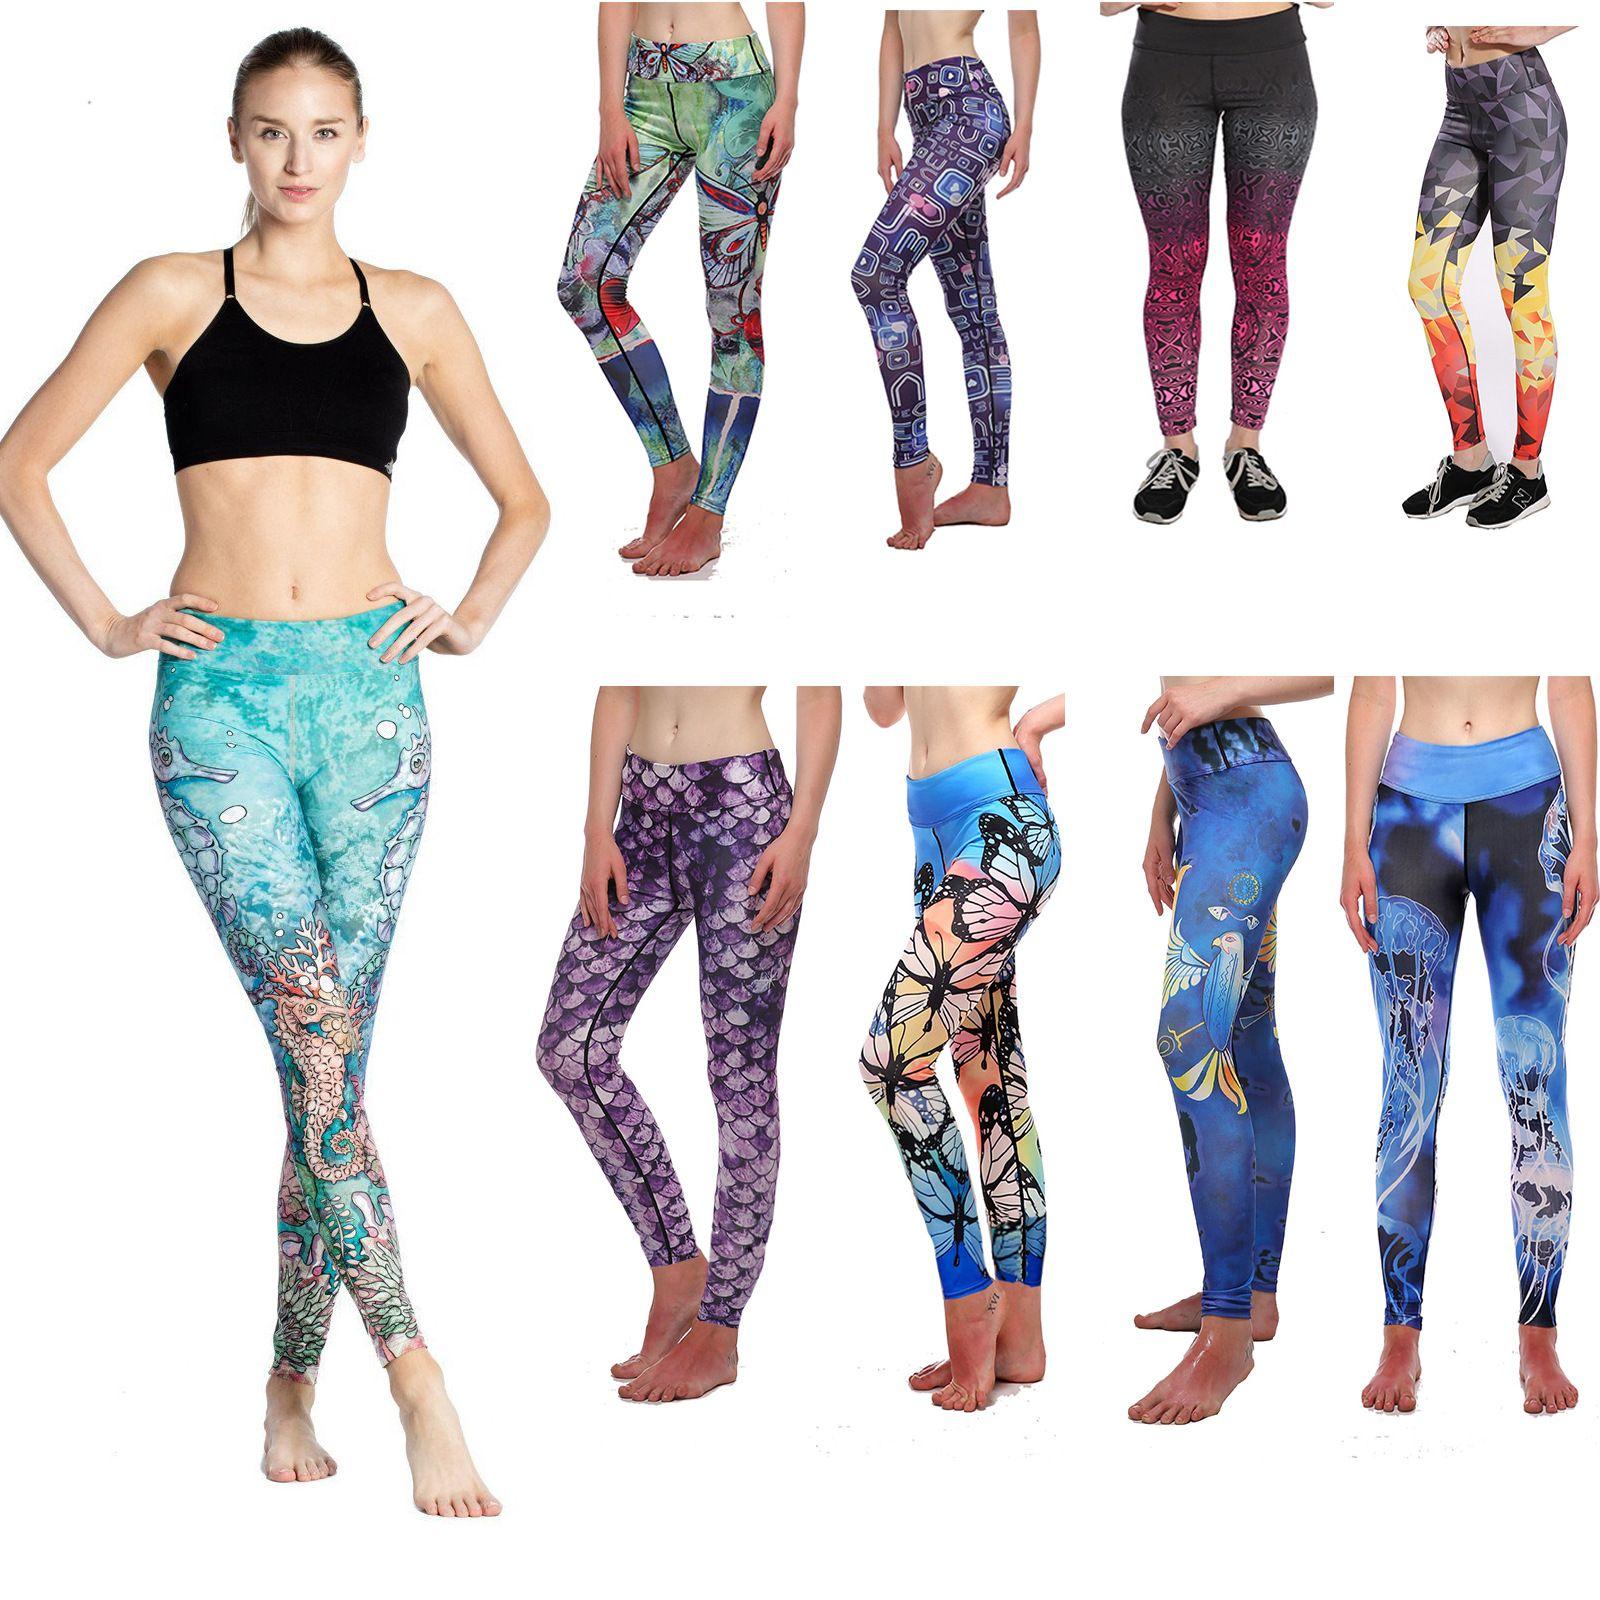 411b705c04c70f 2019 New Arrival Women Leggings Women Home Wear Home Clothing Ninnths Pants  Sport Leggings Slim Yoga Pants From Sweethome123, $6.54 | DHgate.Com